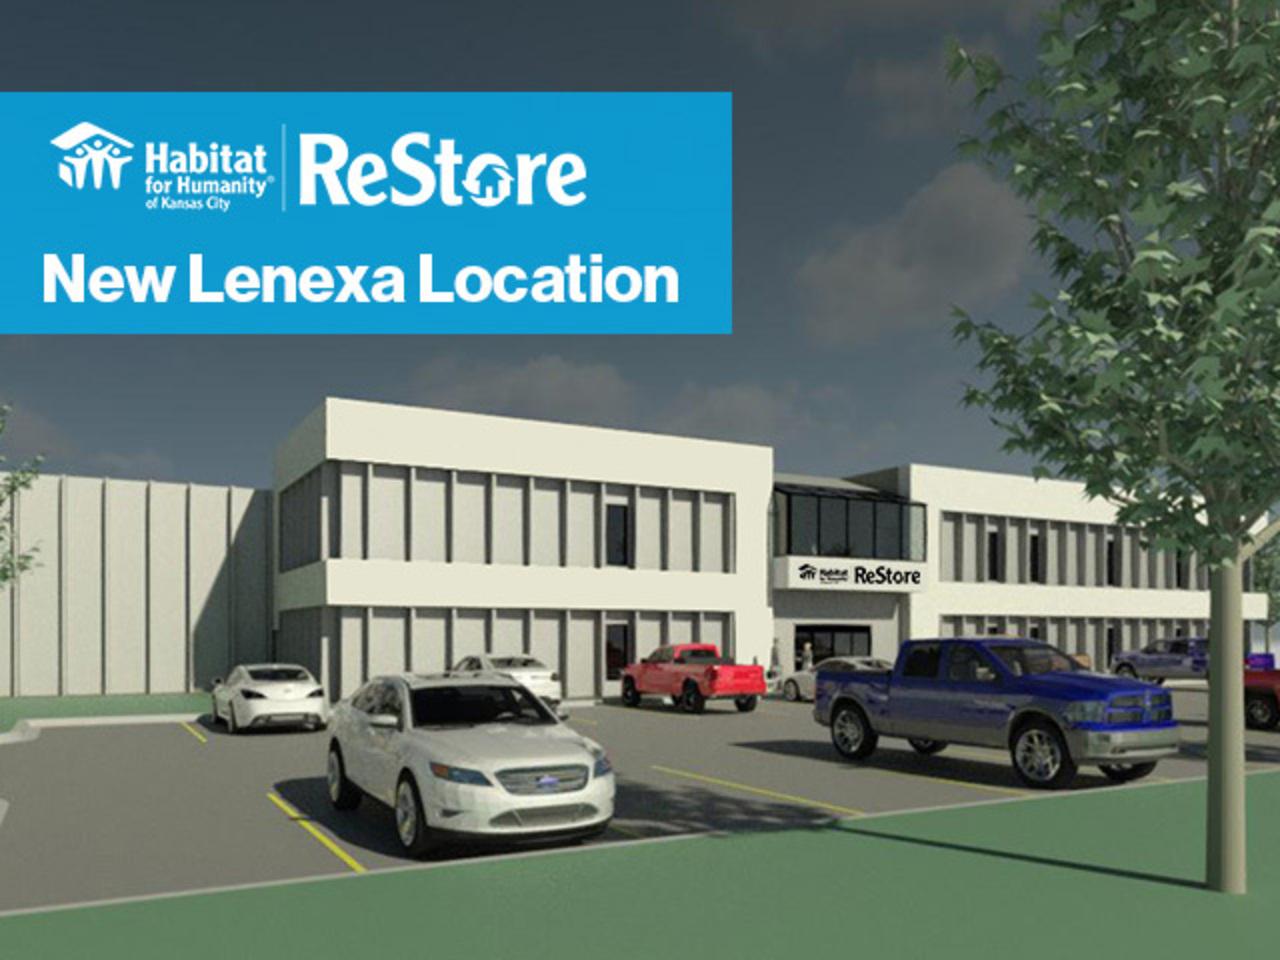 Lenexa ReStore Private Tours